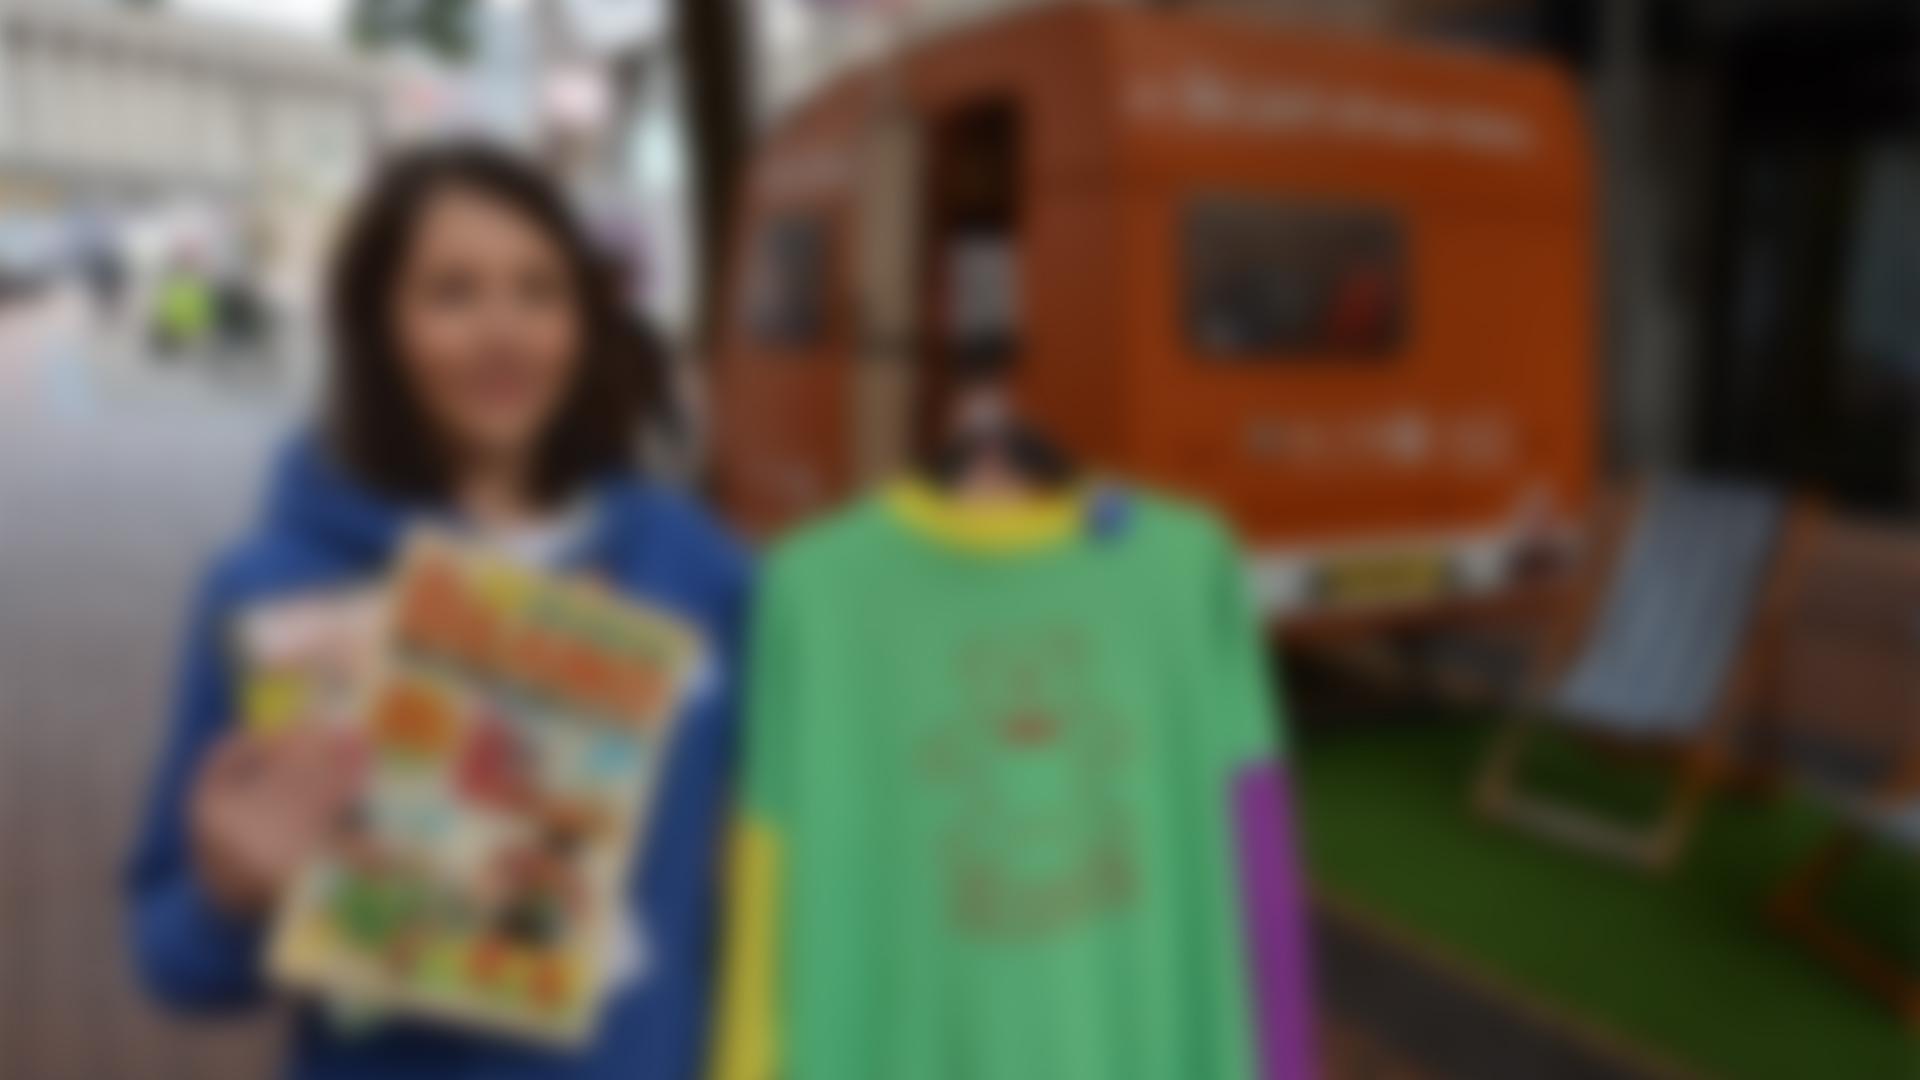 Bright Orange 80s Themed Caravan Visits Brum for Charity's 30th Birthday